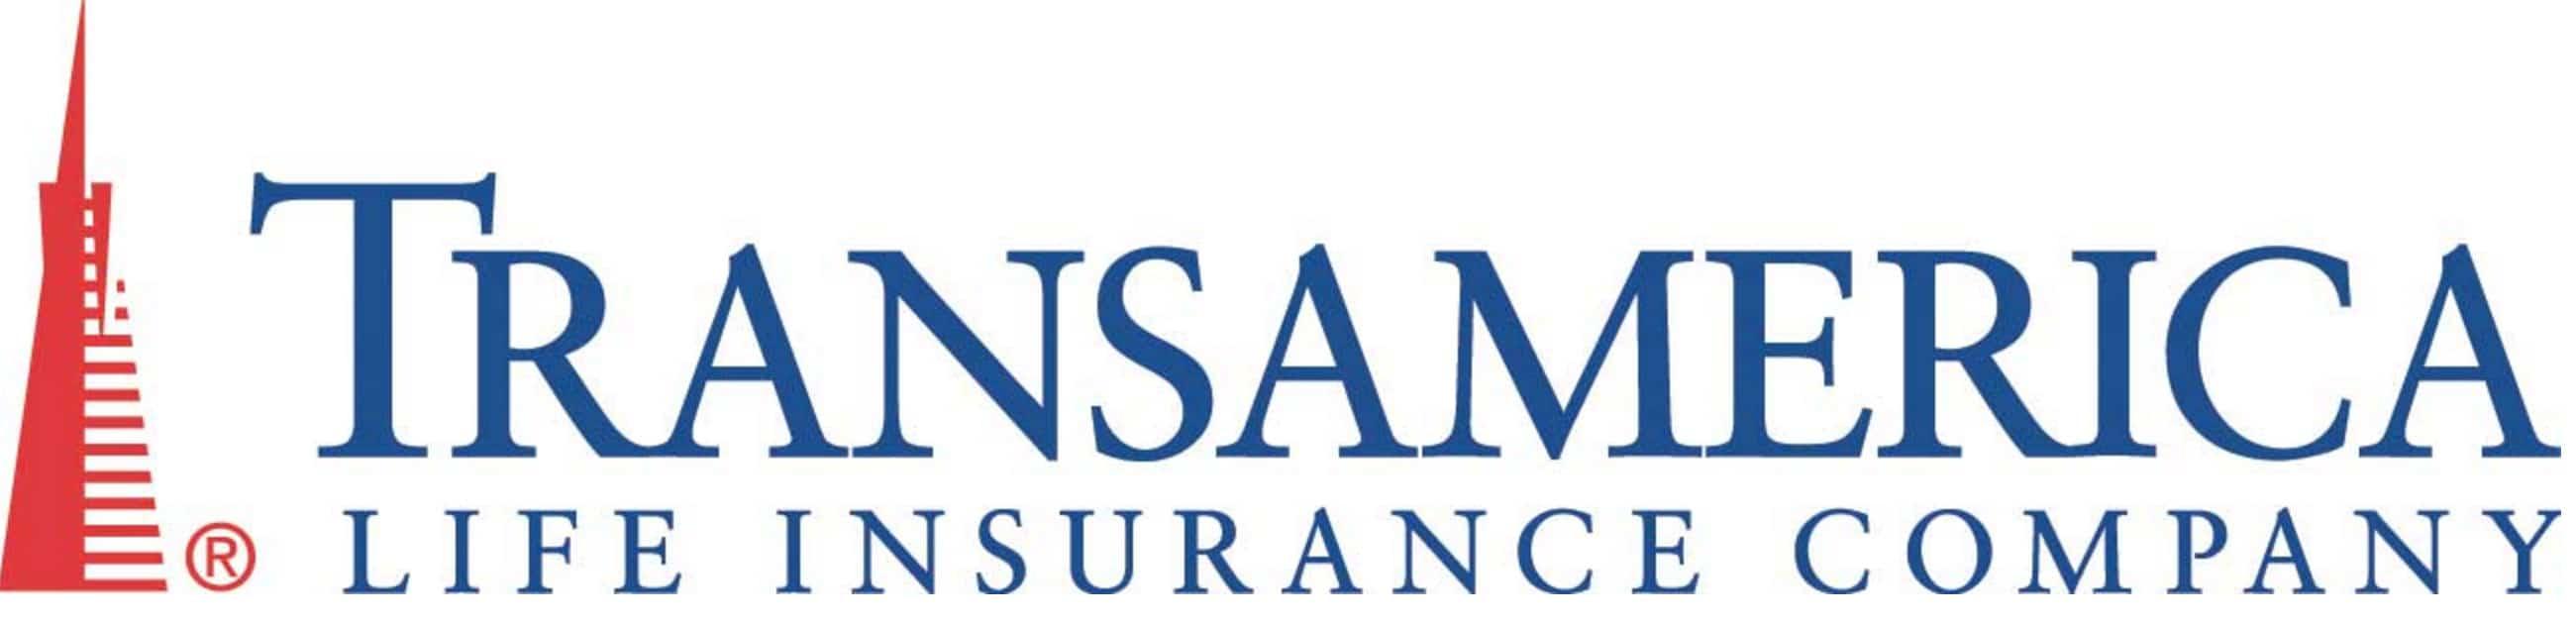 transamerica life insurance company photo - 1